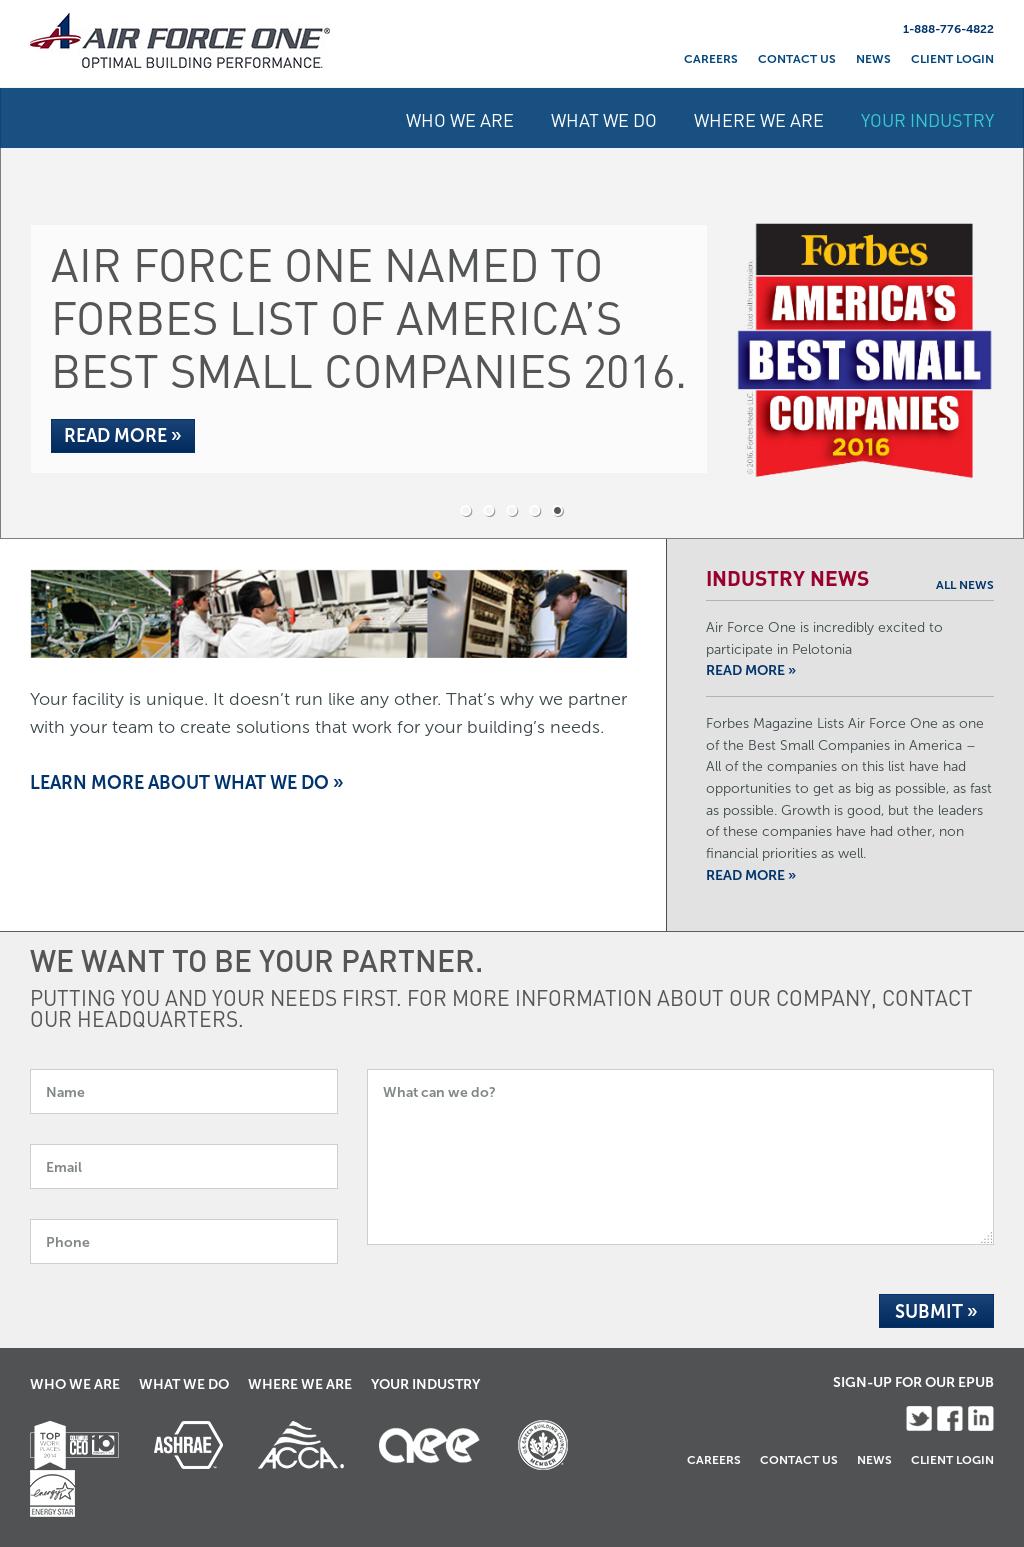 air force email login